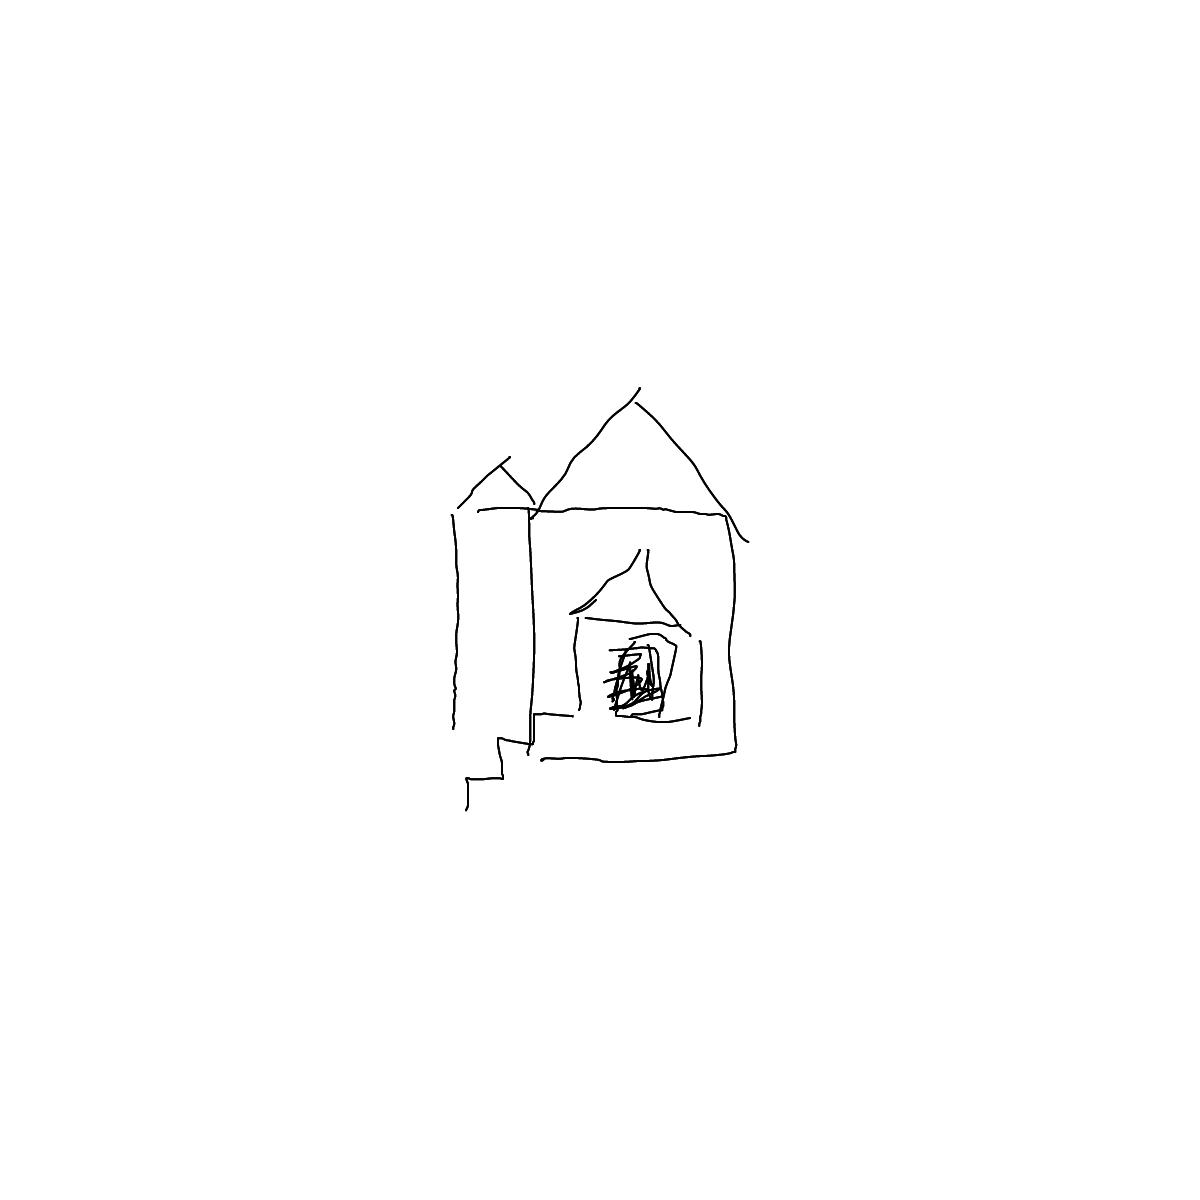 BAAAM drawing#166 lat:45.7856445312500000lng: -111.1772155761718800